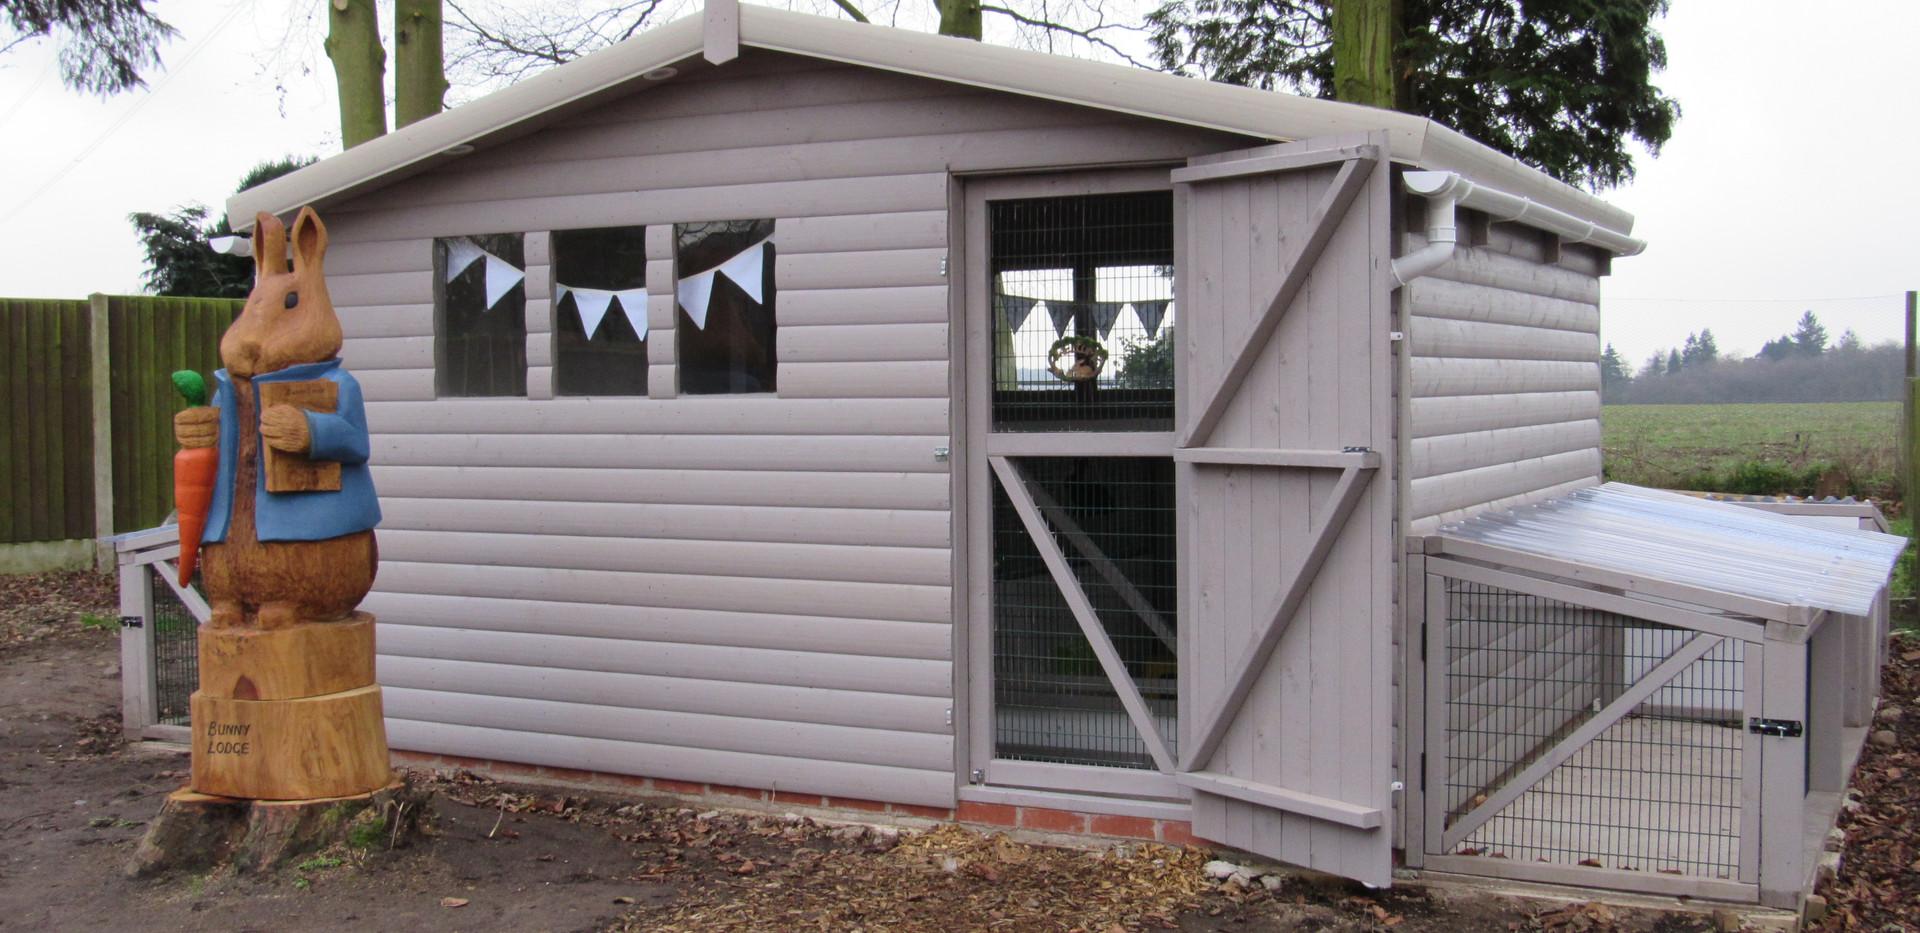 Bunny Lodge Exterior